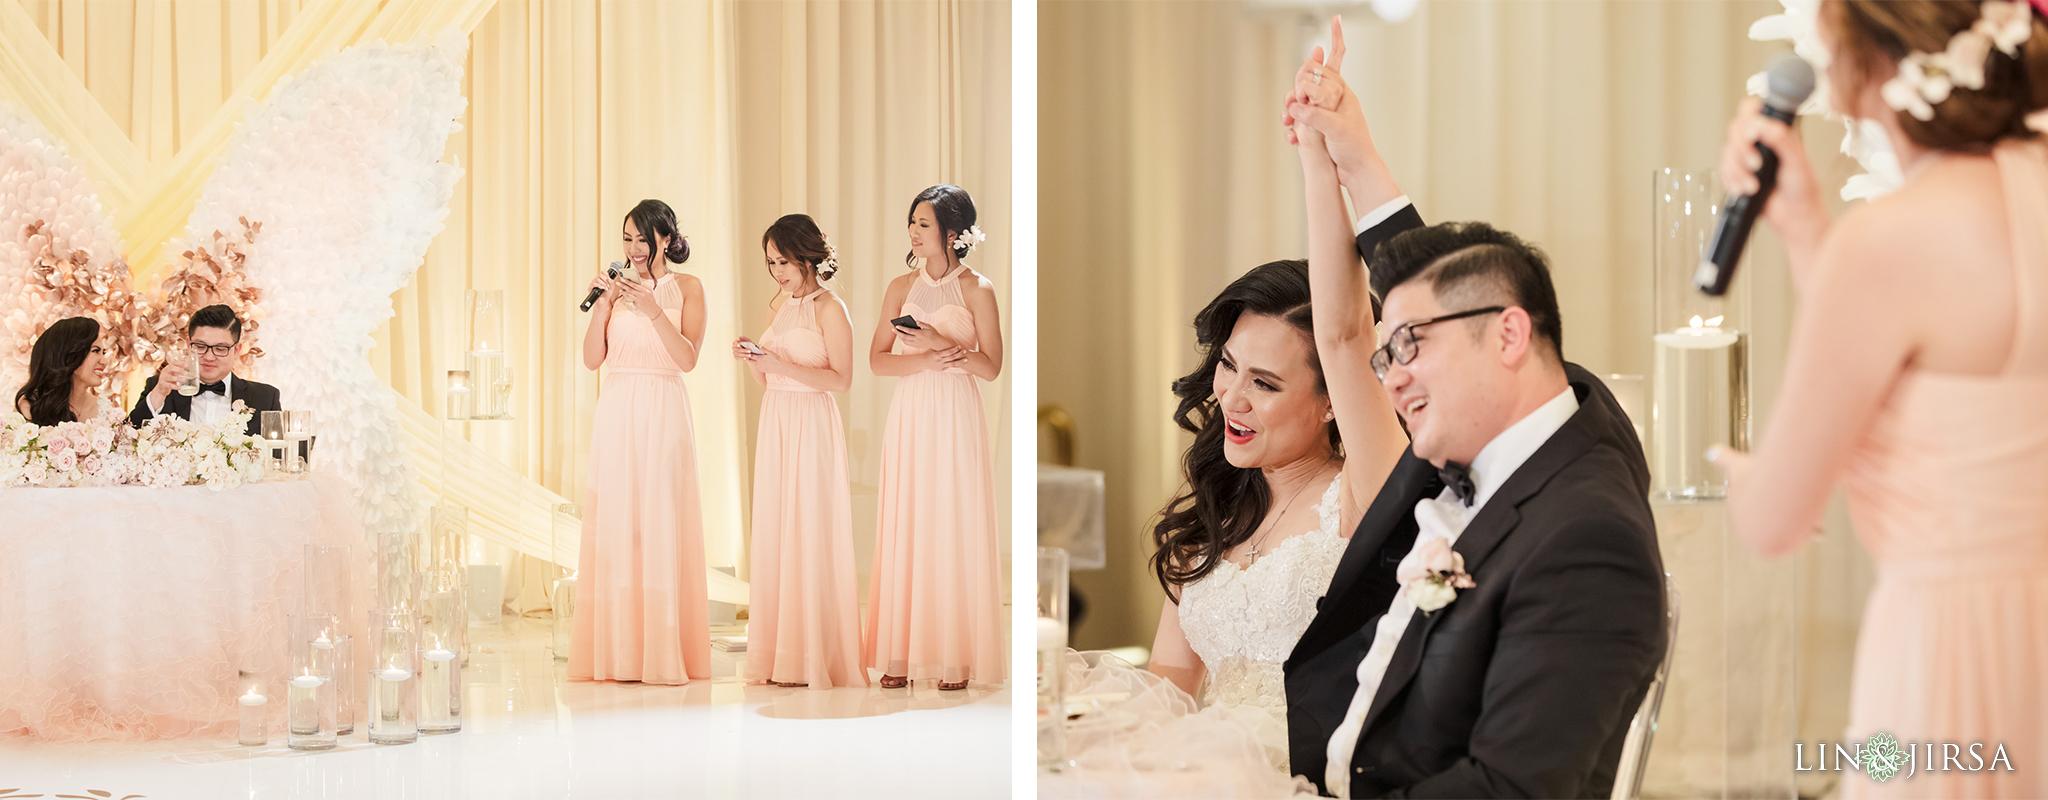 33 Hilton Anaheim Vietnamese Wedding Photography